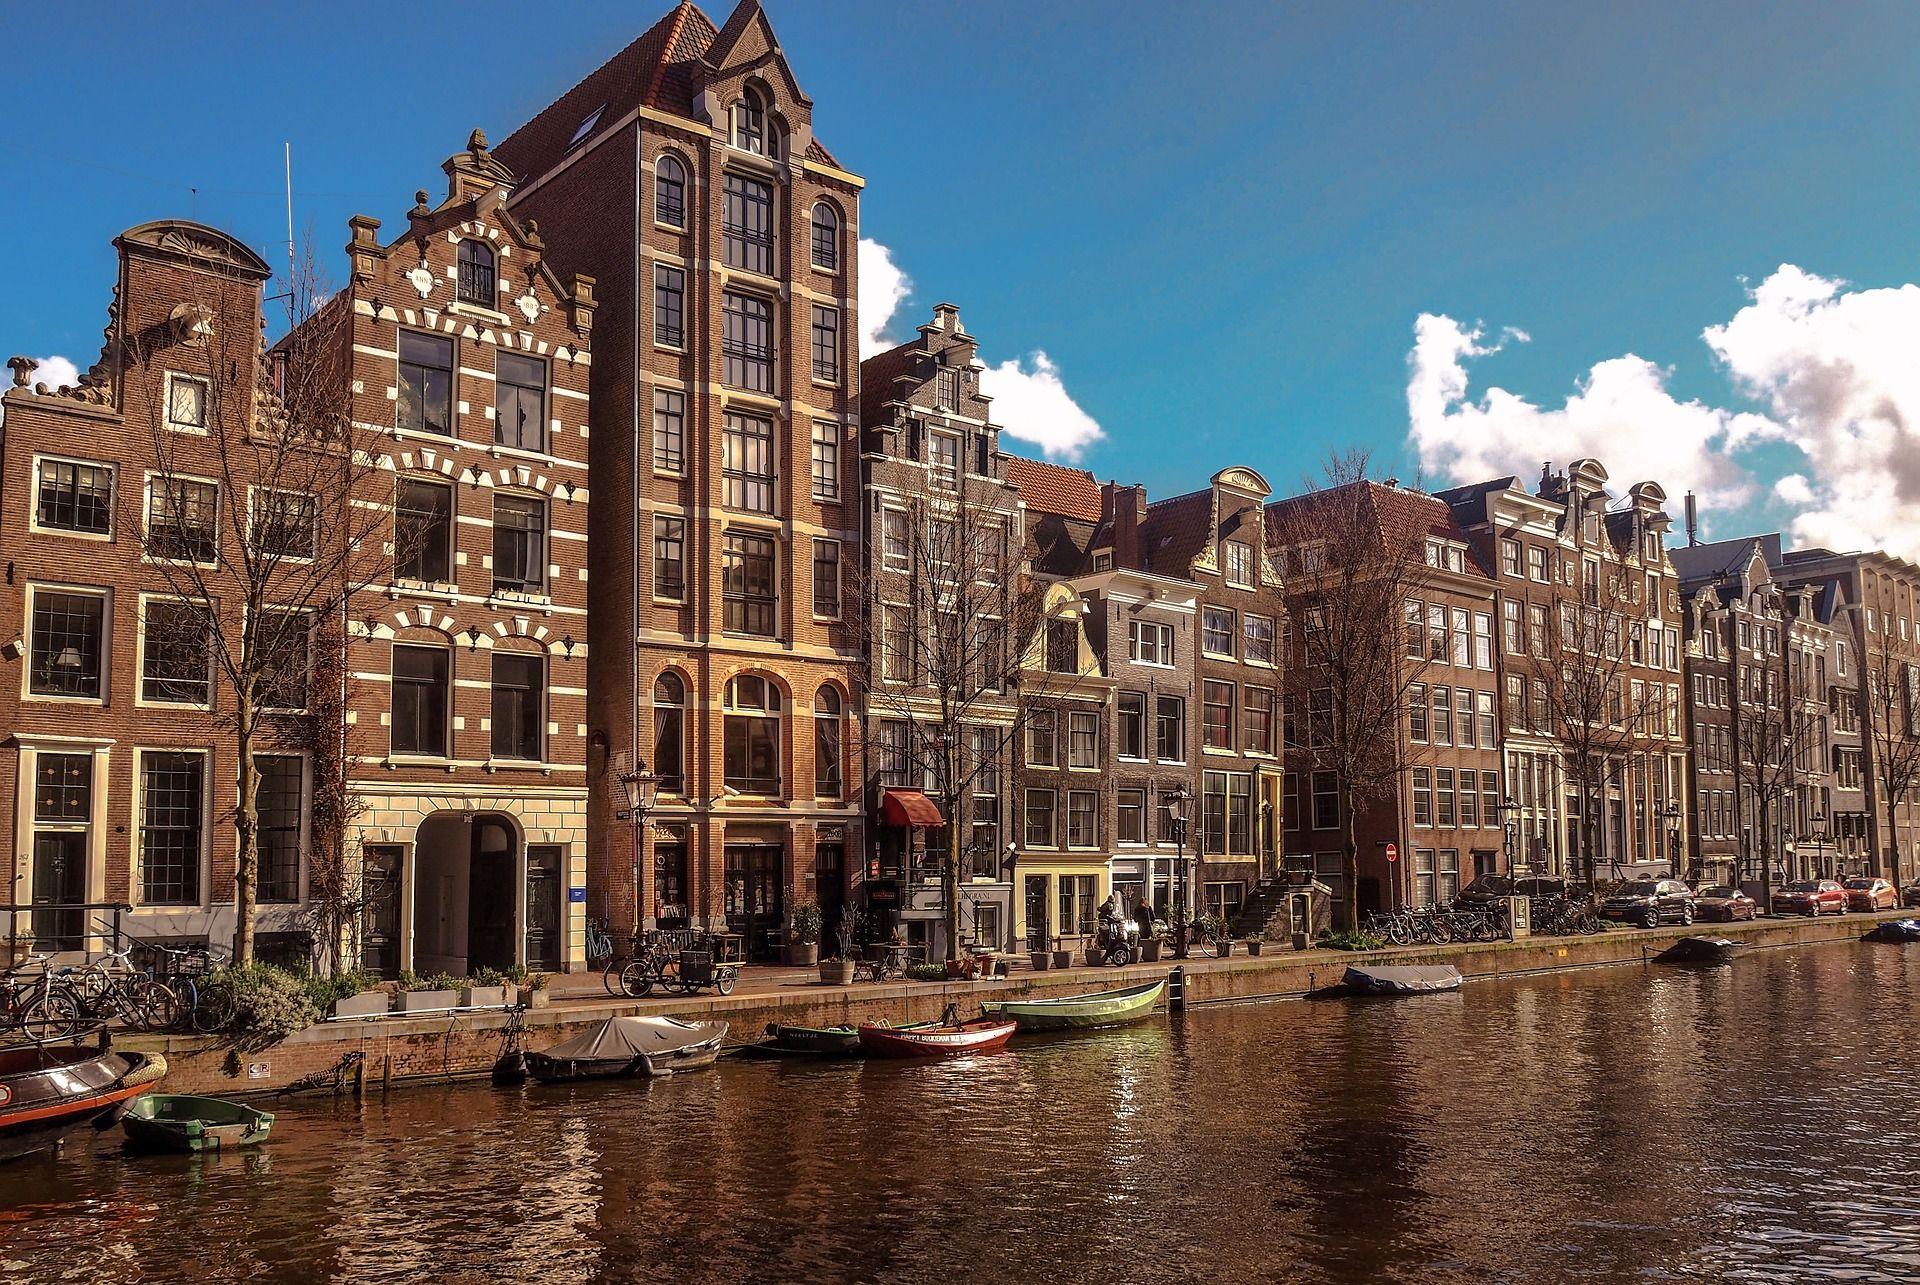 Vacante Amsterdam